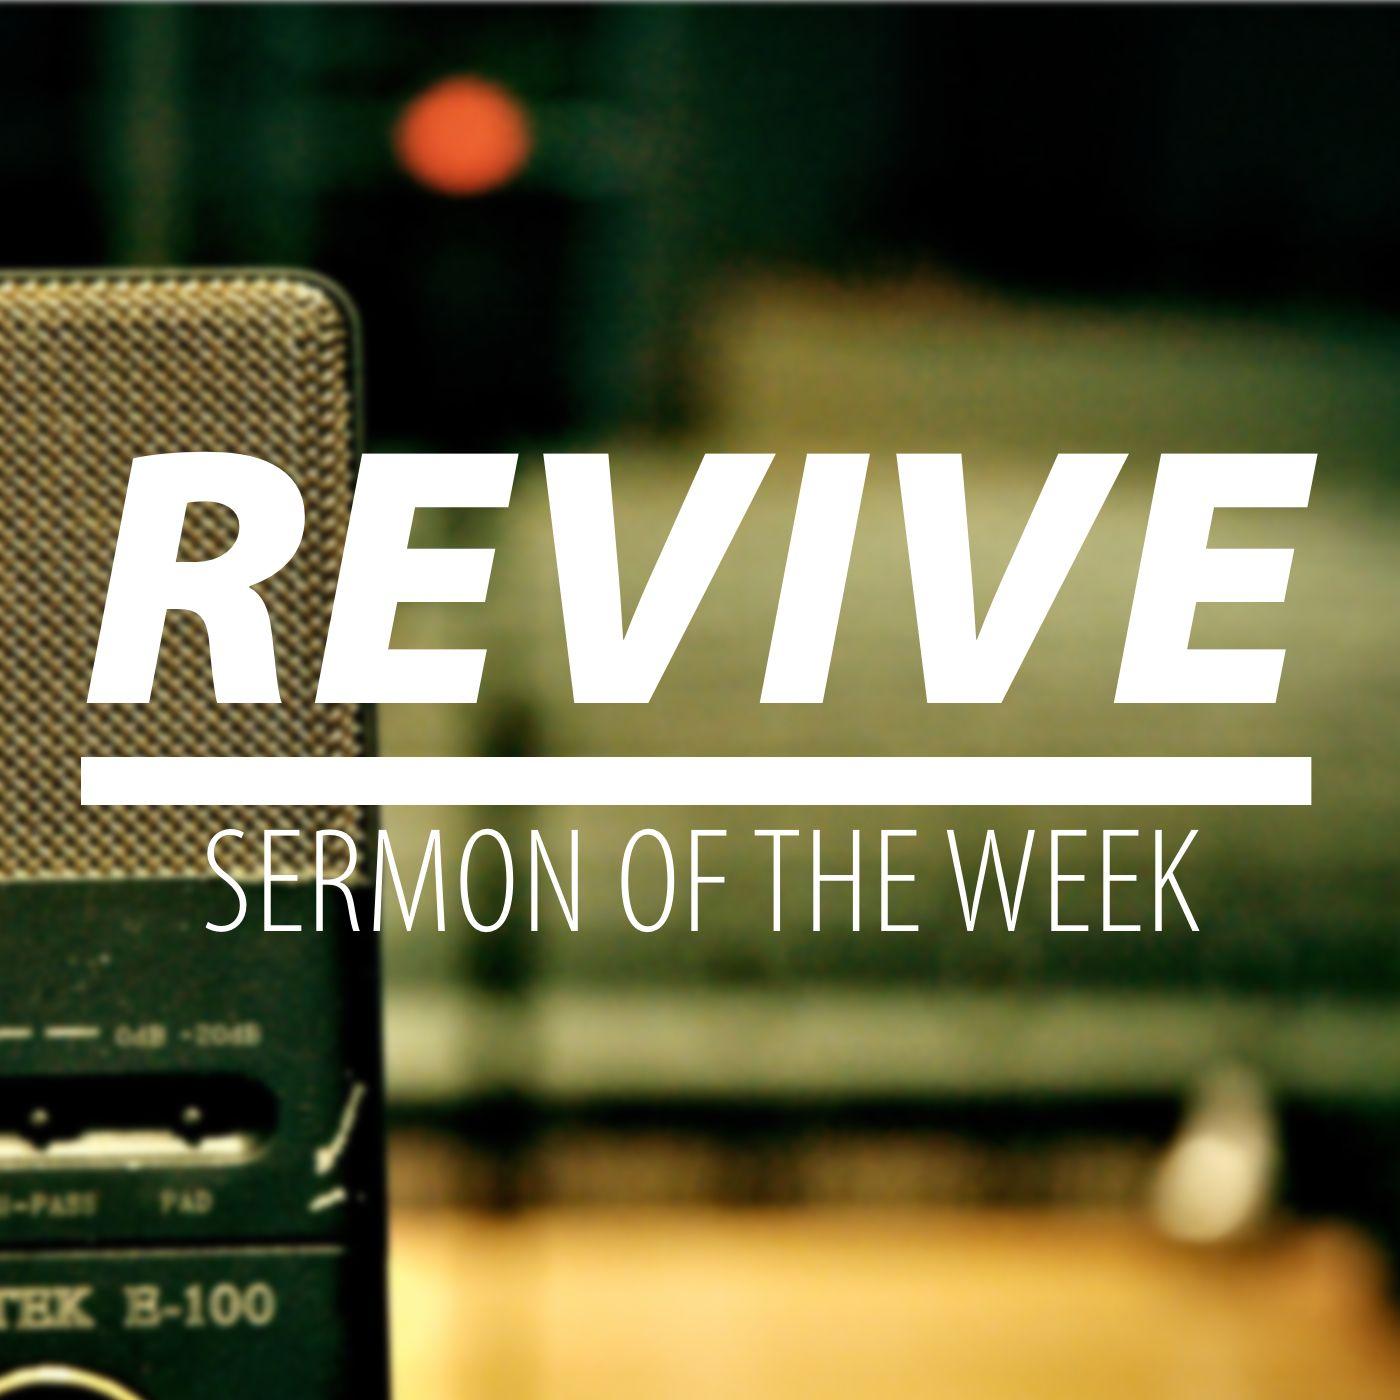 REVIVE SERMON OF THE WEEK